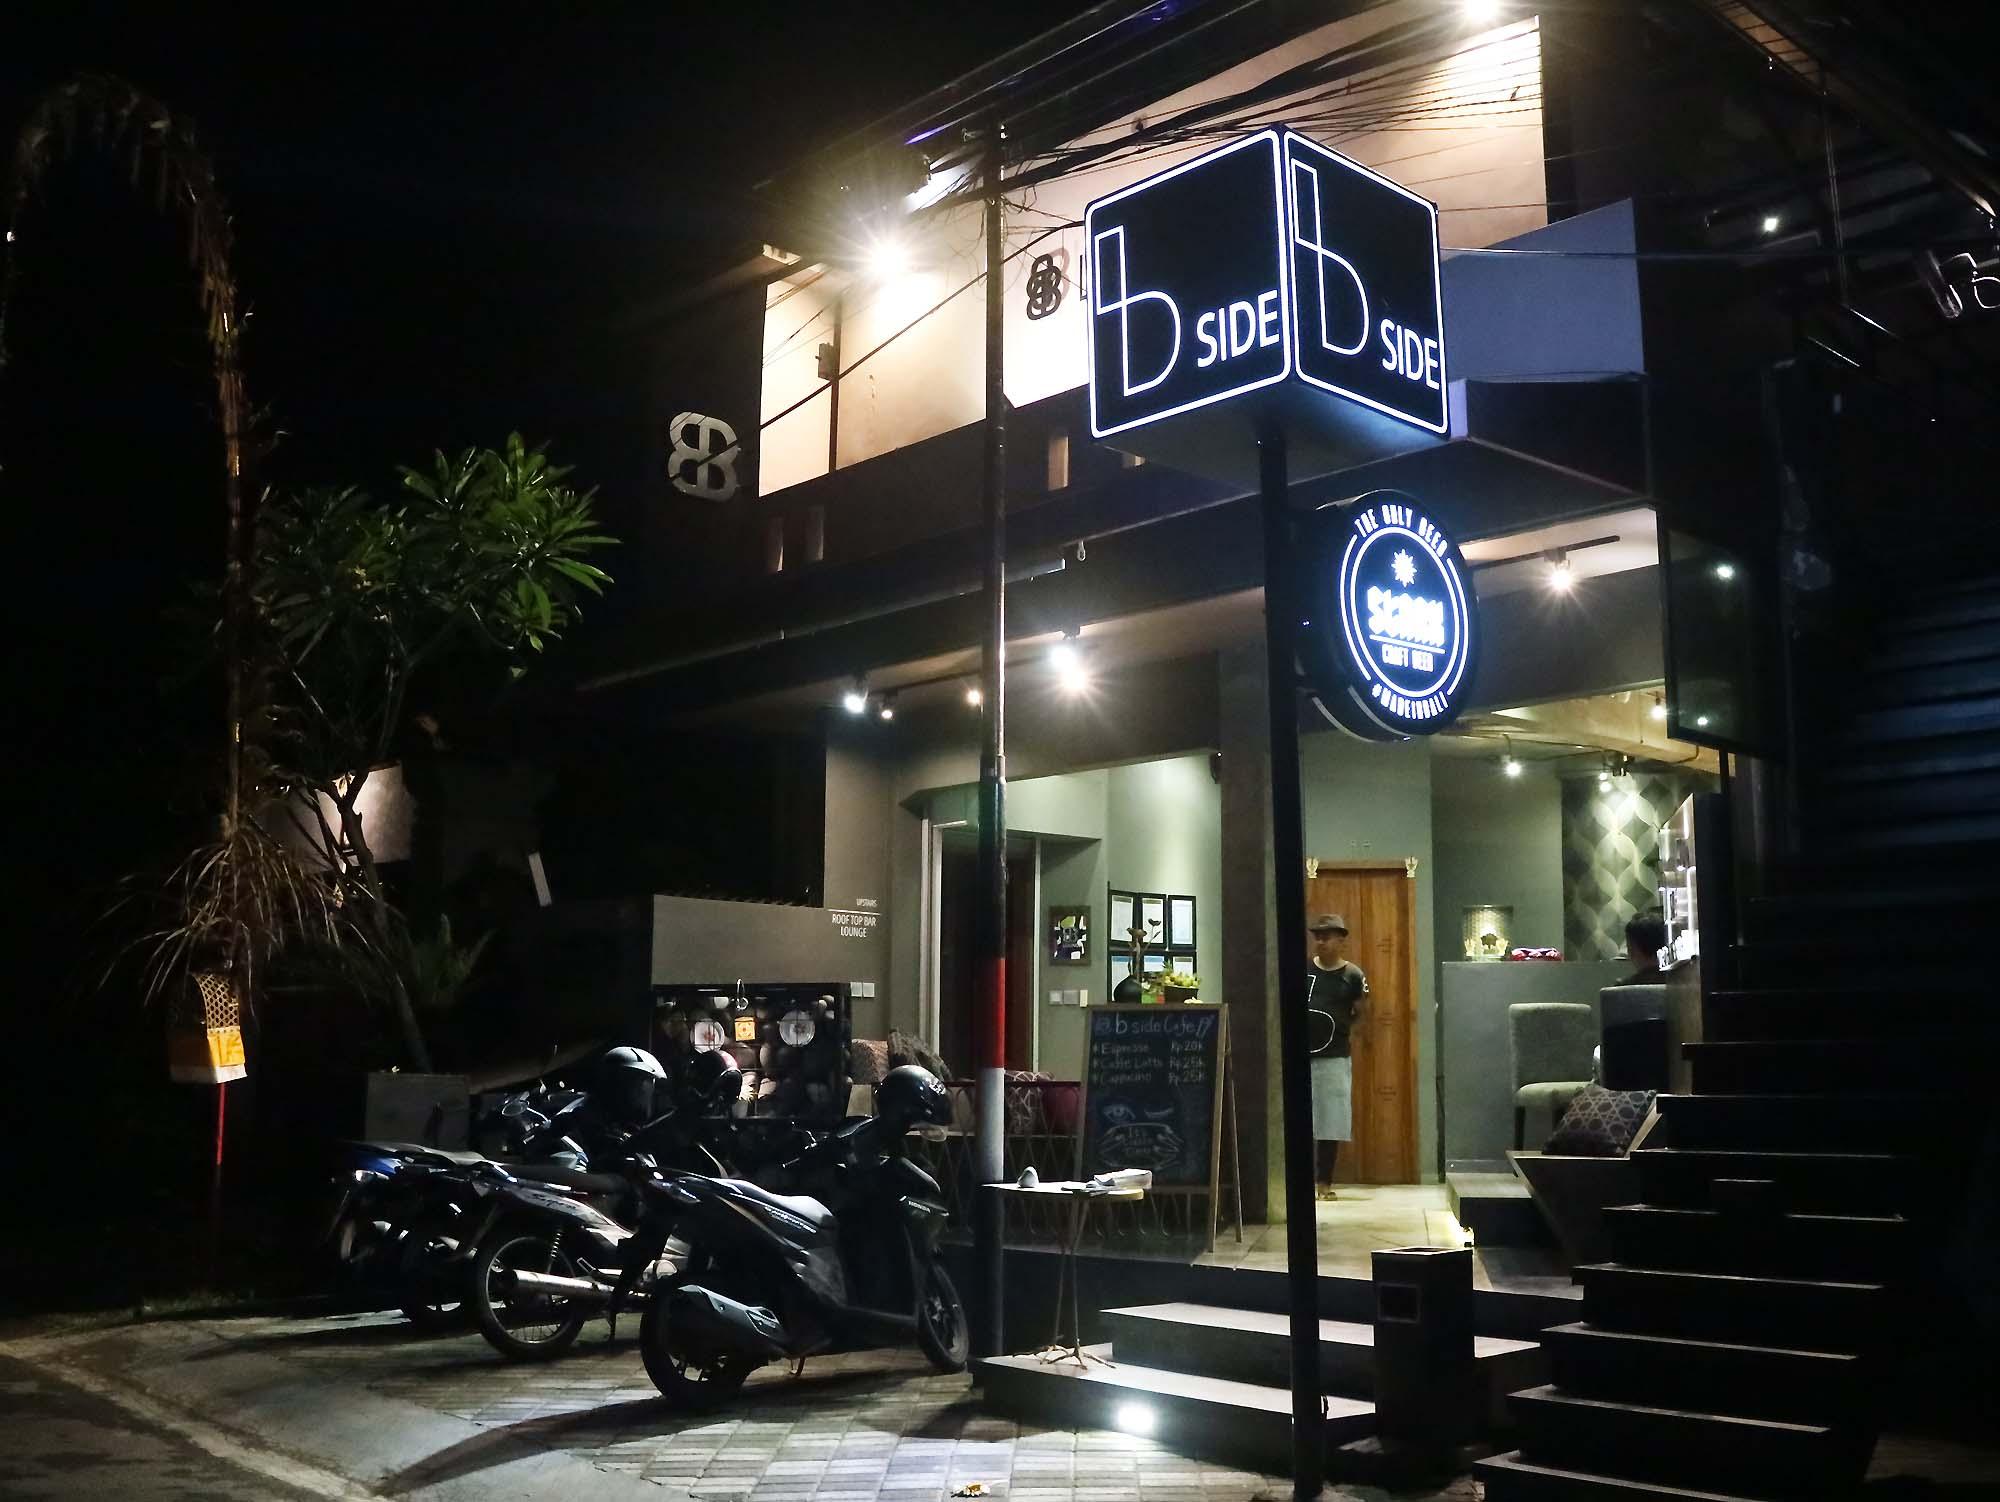 Modern Balinese Cafe bside